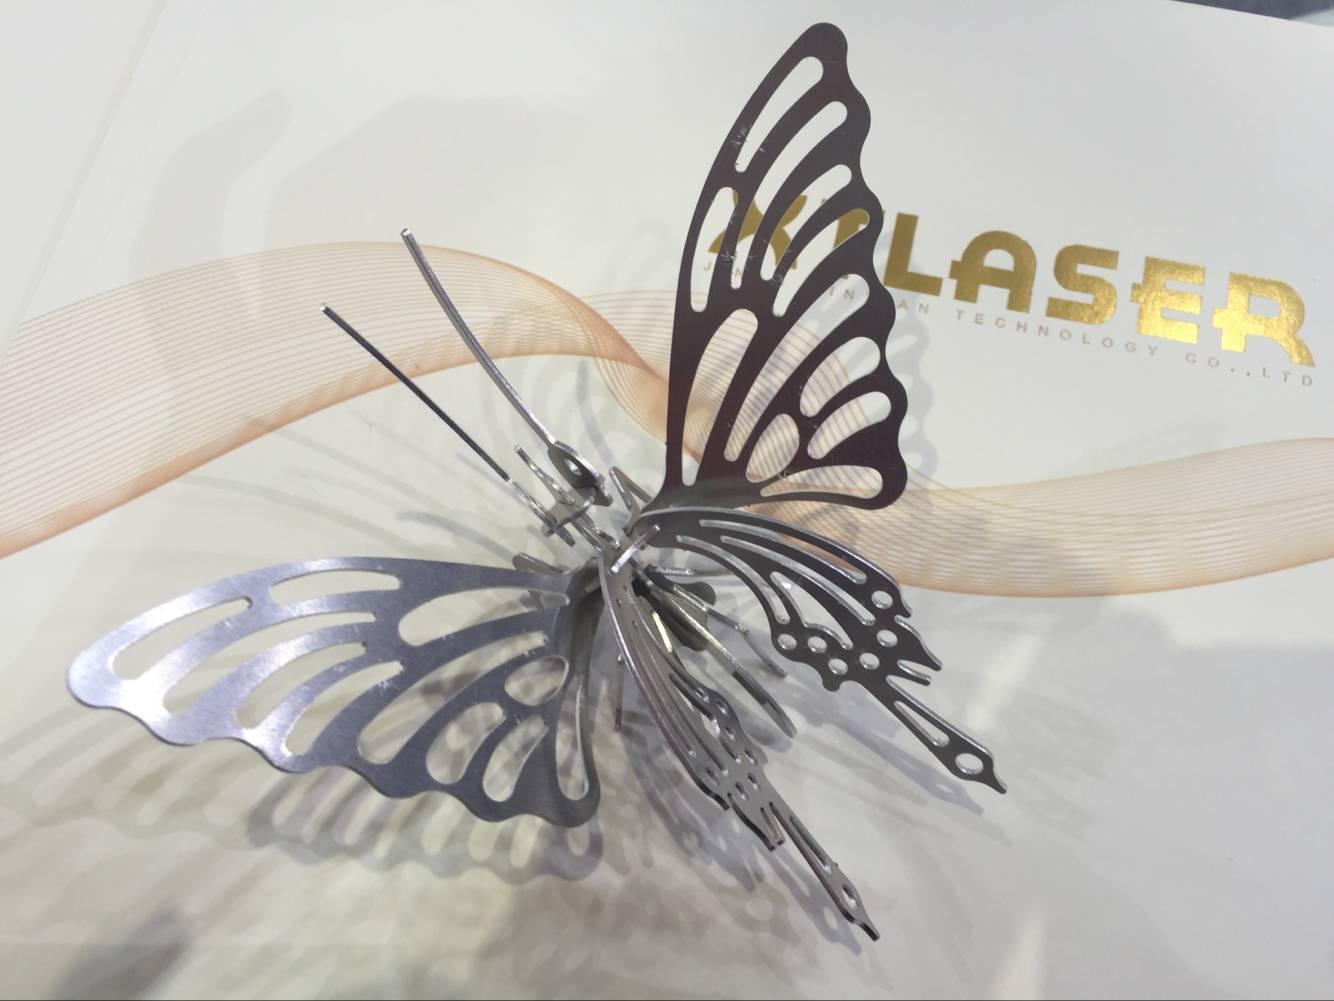 Linear Motor Fiber Laser Cutting Machine Applied Industry